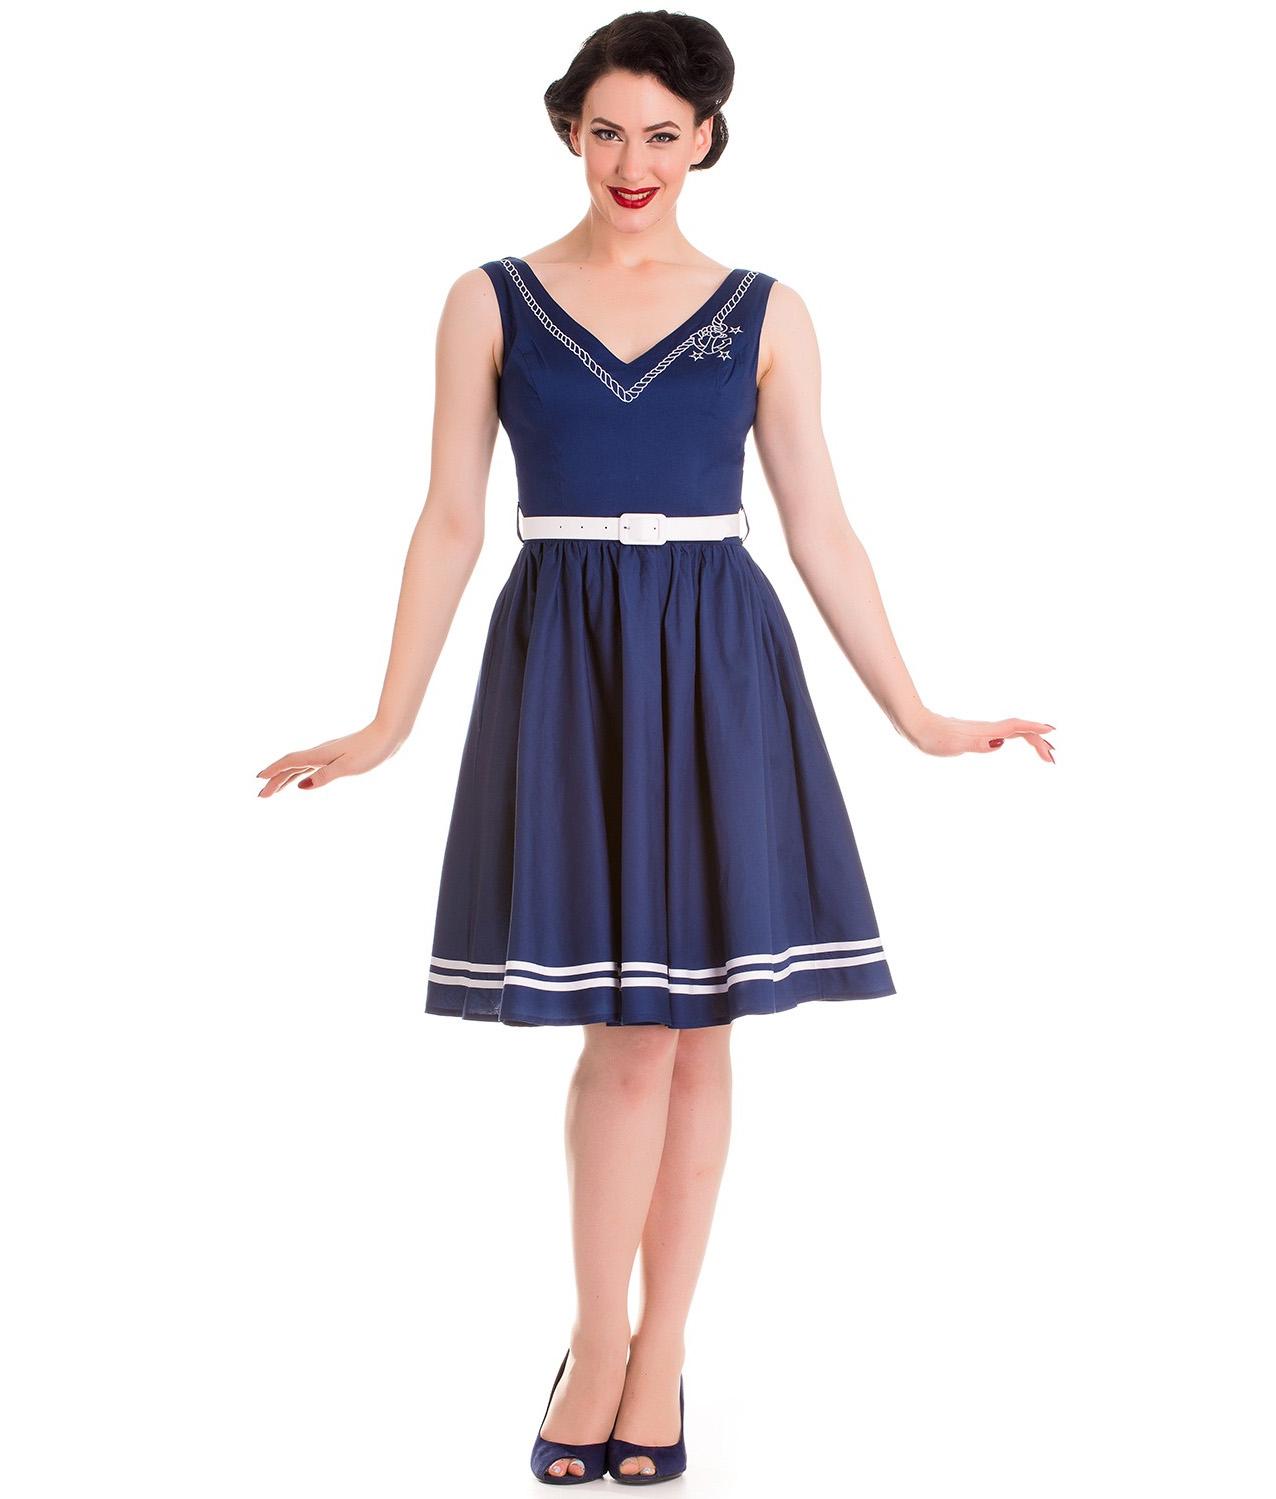 Hell-Bunny-Nautical-Sailor-Pin-Up-Mid-Length-50s-Dress-ARIEL-Navy-Blue-All-Sizes thumbnail 3